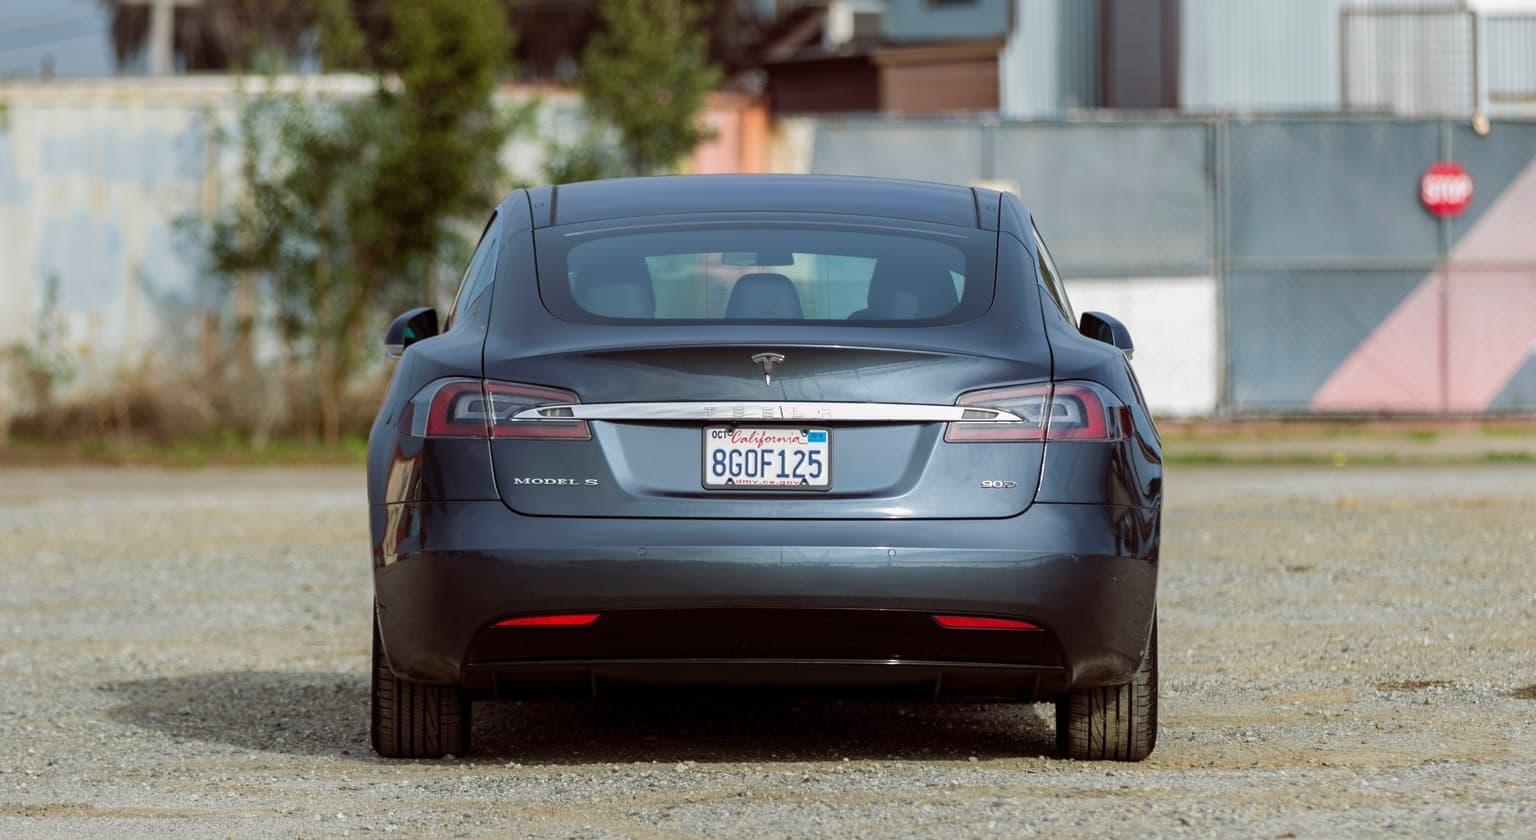 Car Rentals In Fresno Ca Turo